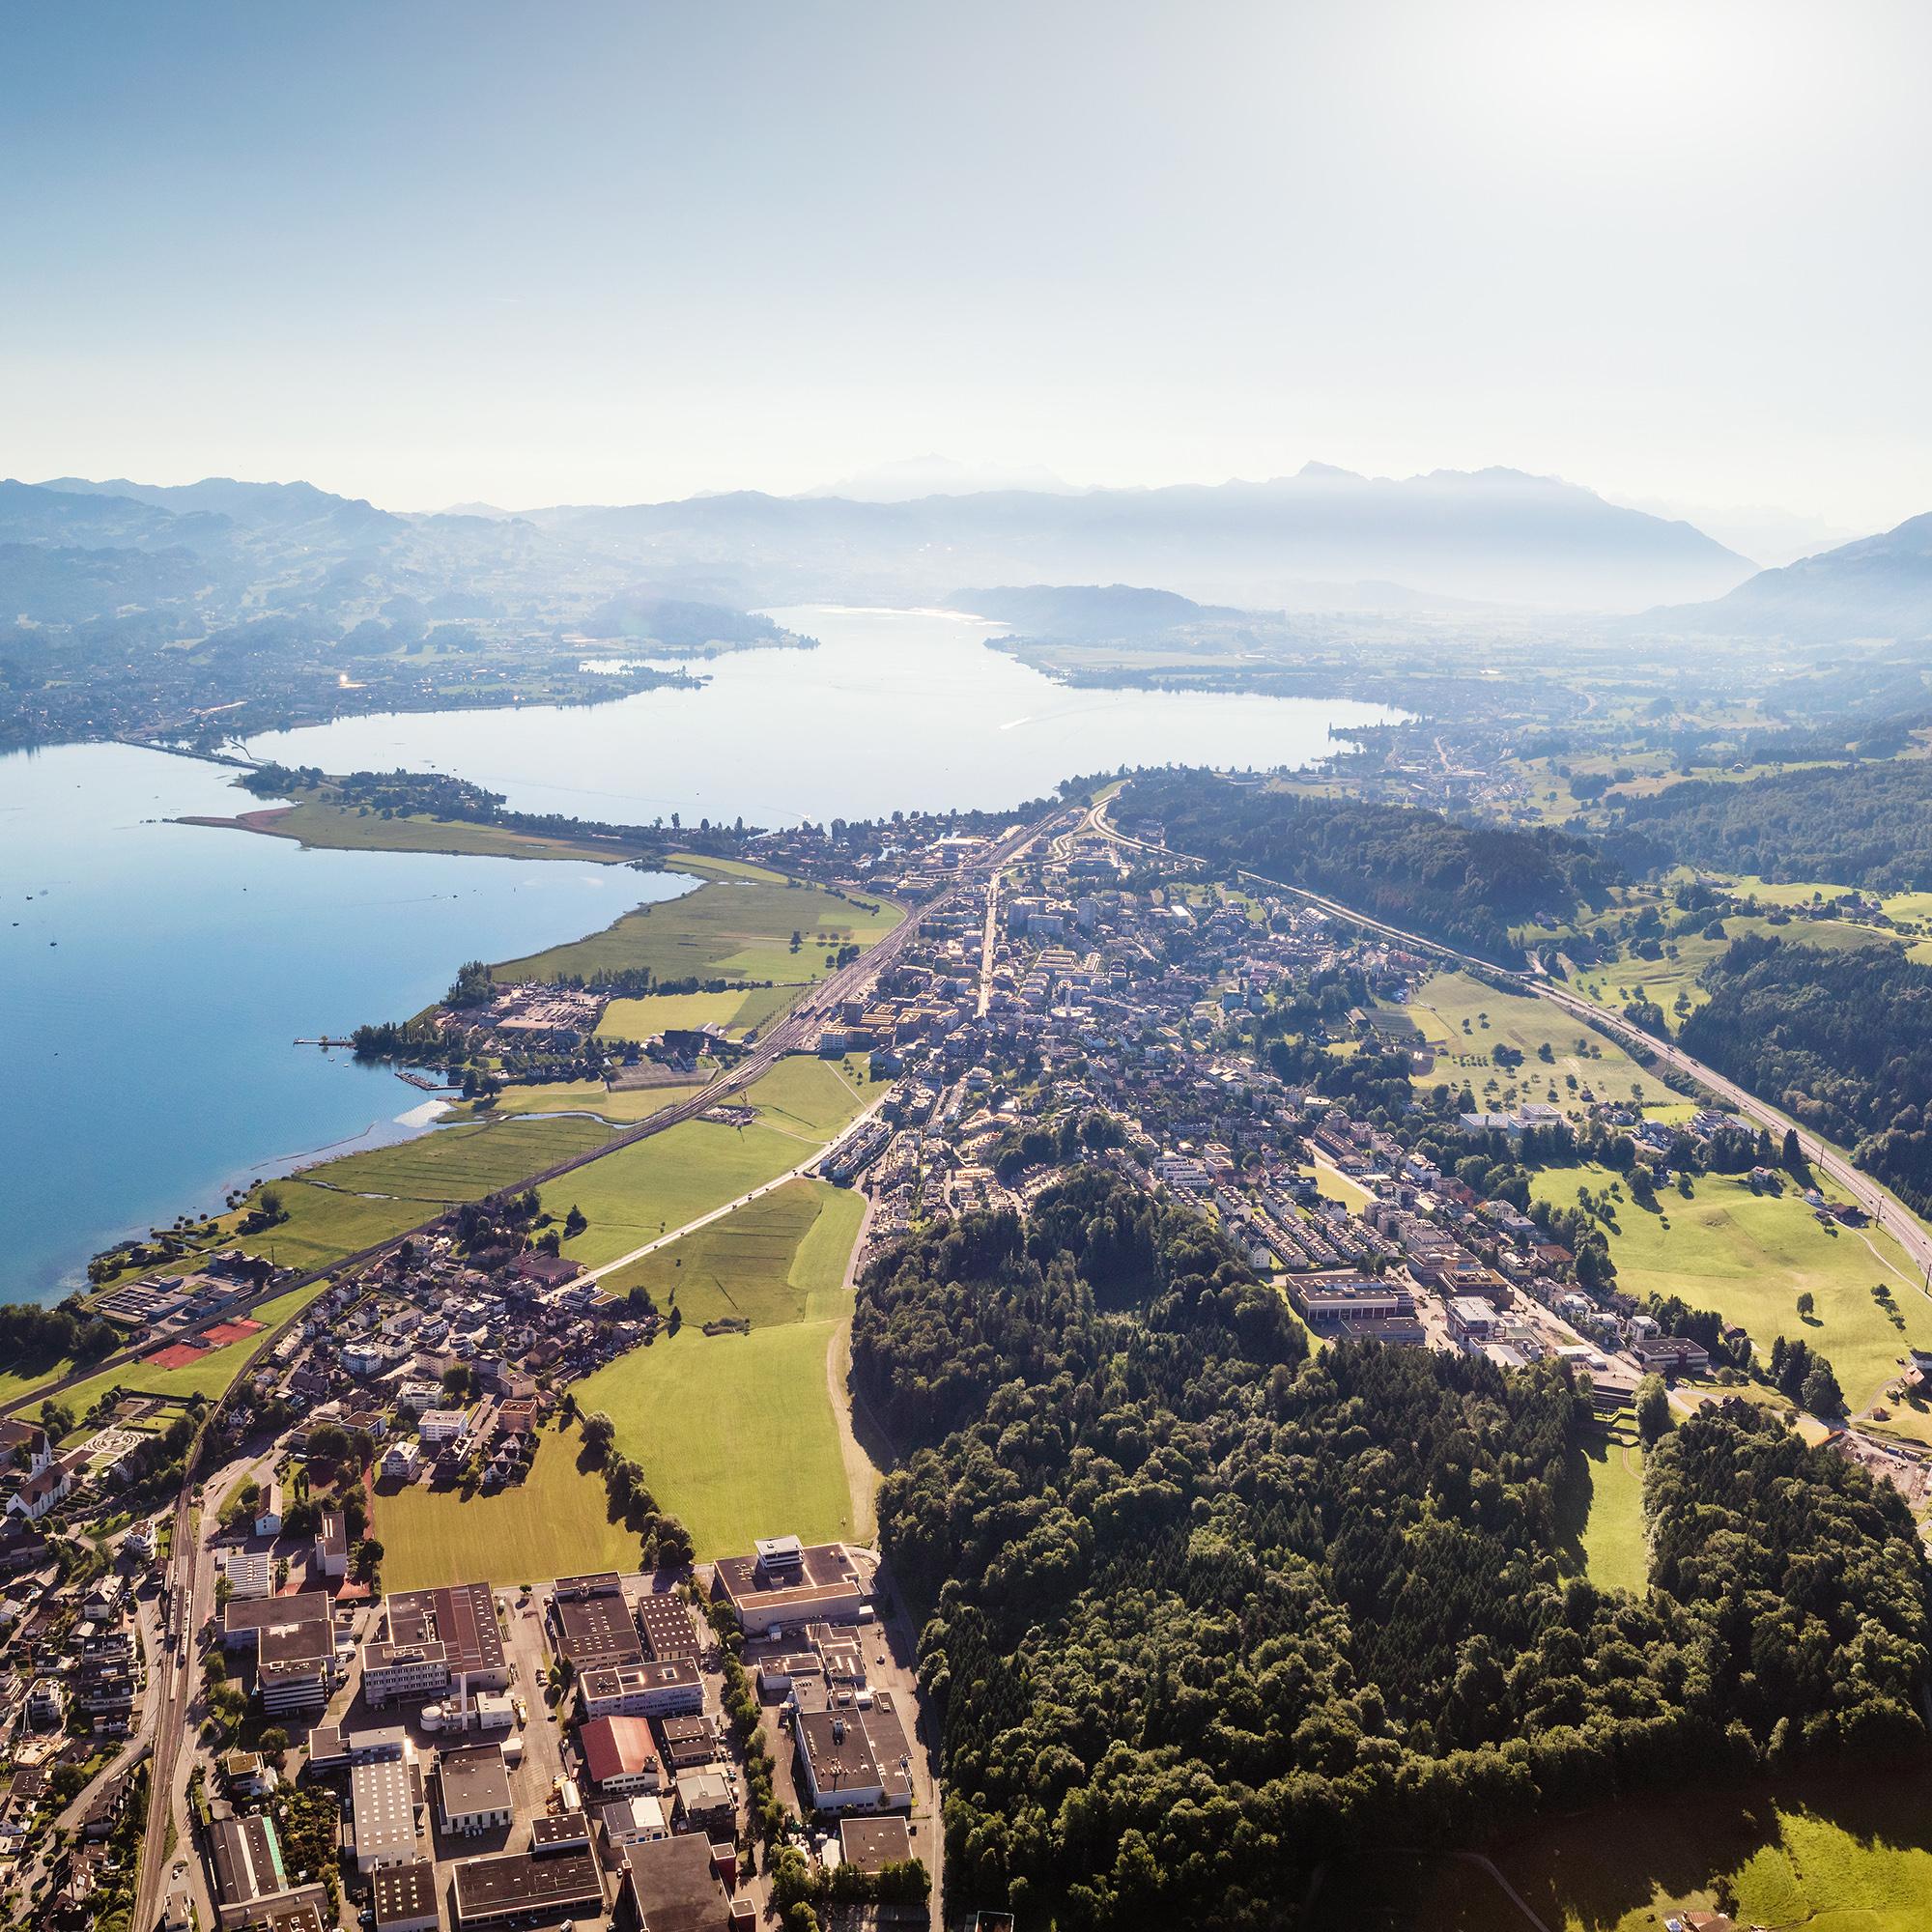 Luftaufnahme_Agglo_Obersee